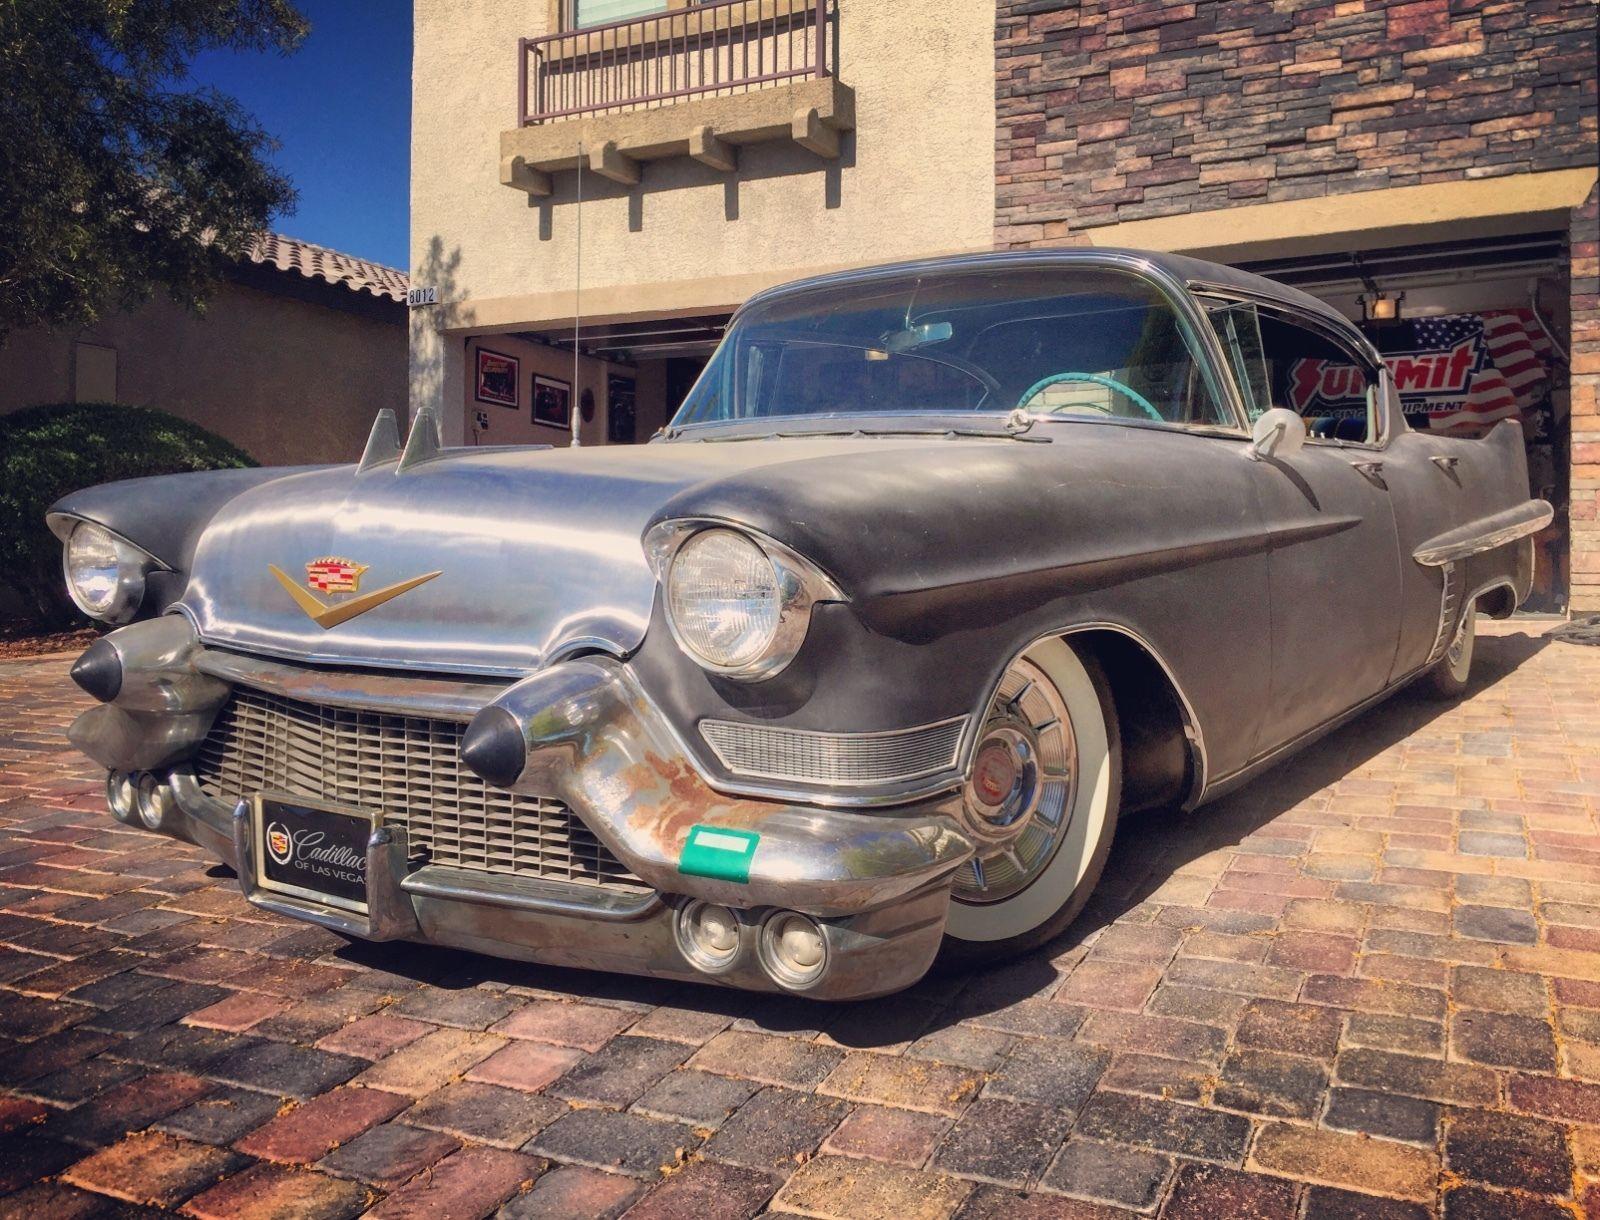 1957 cadillac sedan deville 57 hot rod rat rod kustom black plate